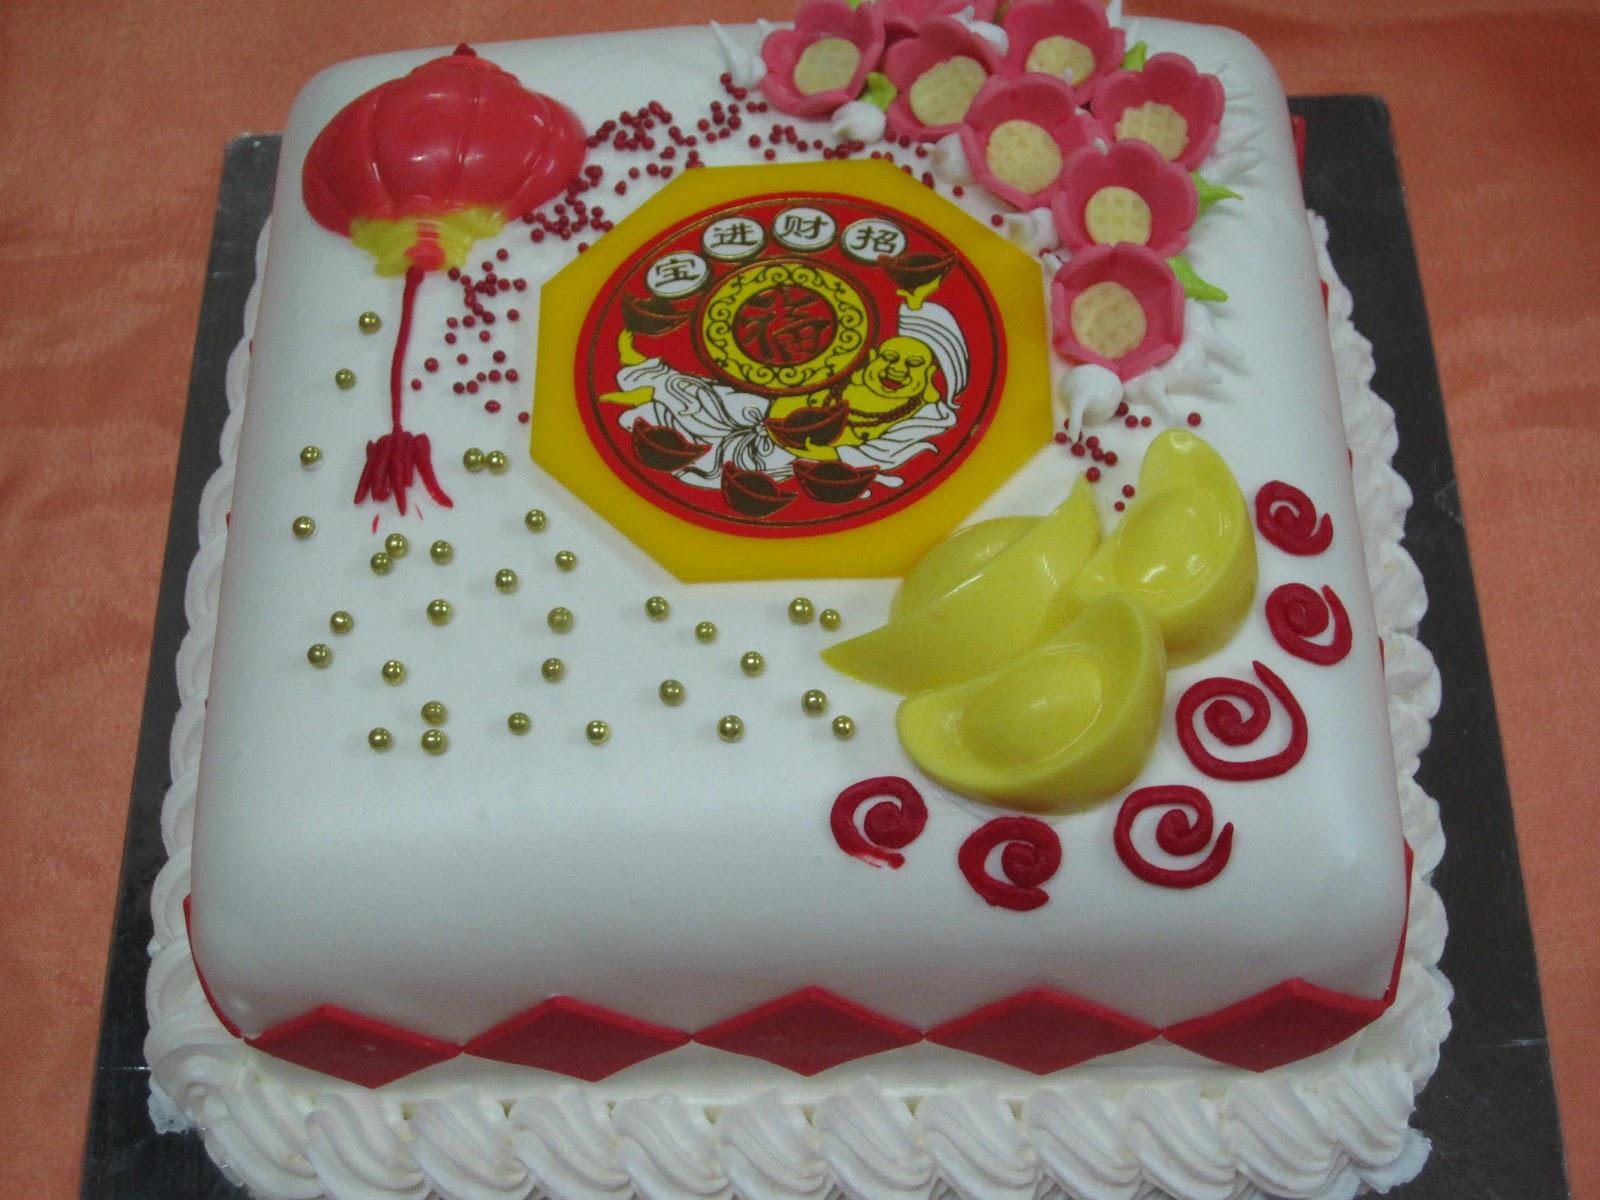 Design Kue Tart Cake Ideas And Designs